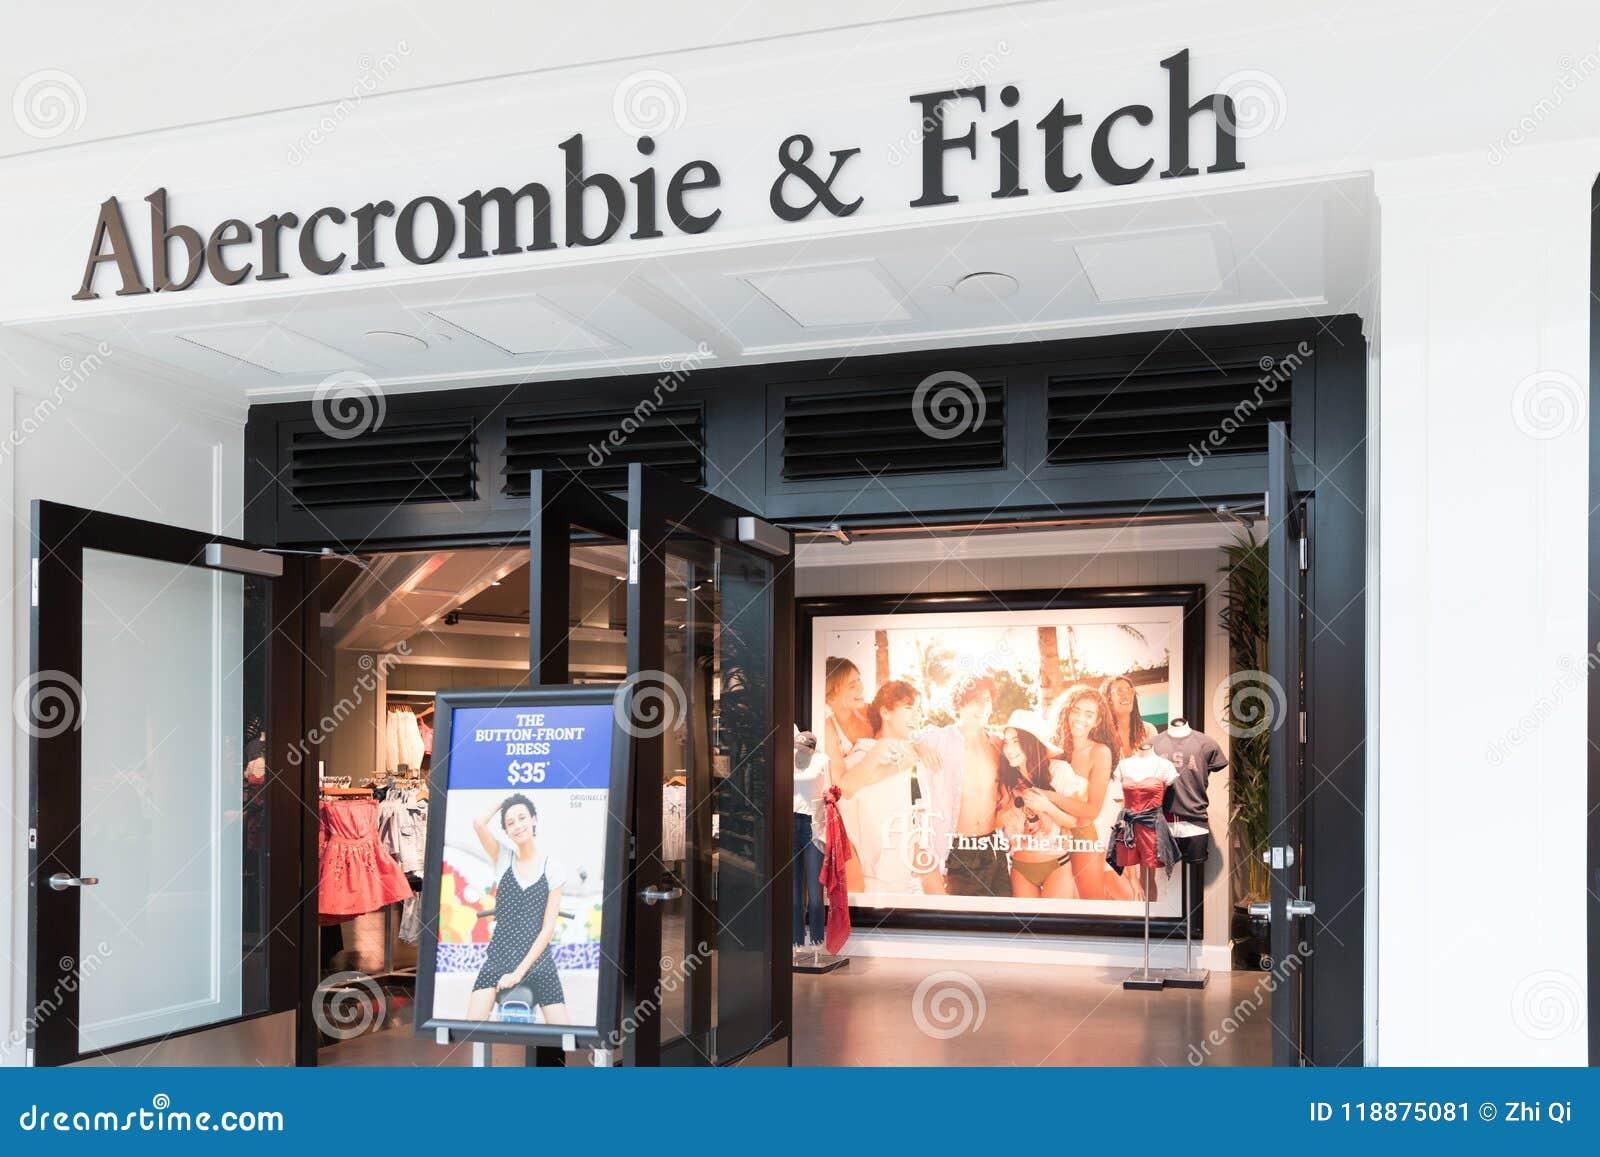 Abercrombie & Fitch Clothing Store i Philadelphia I